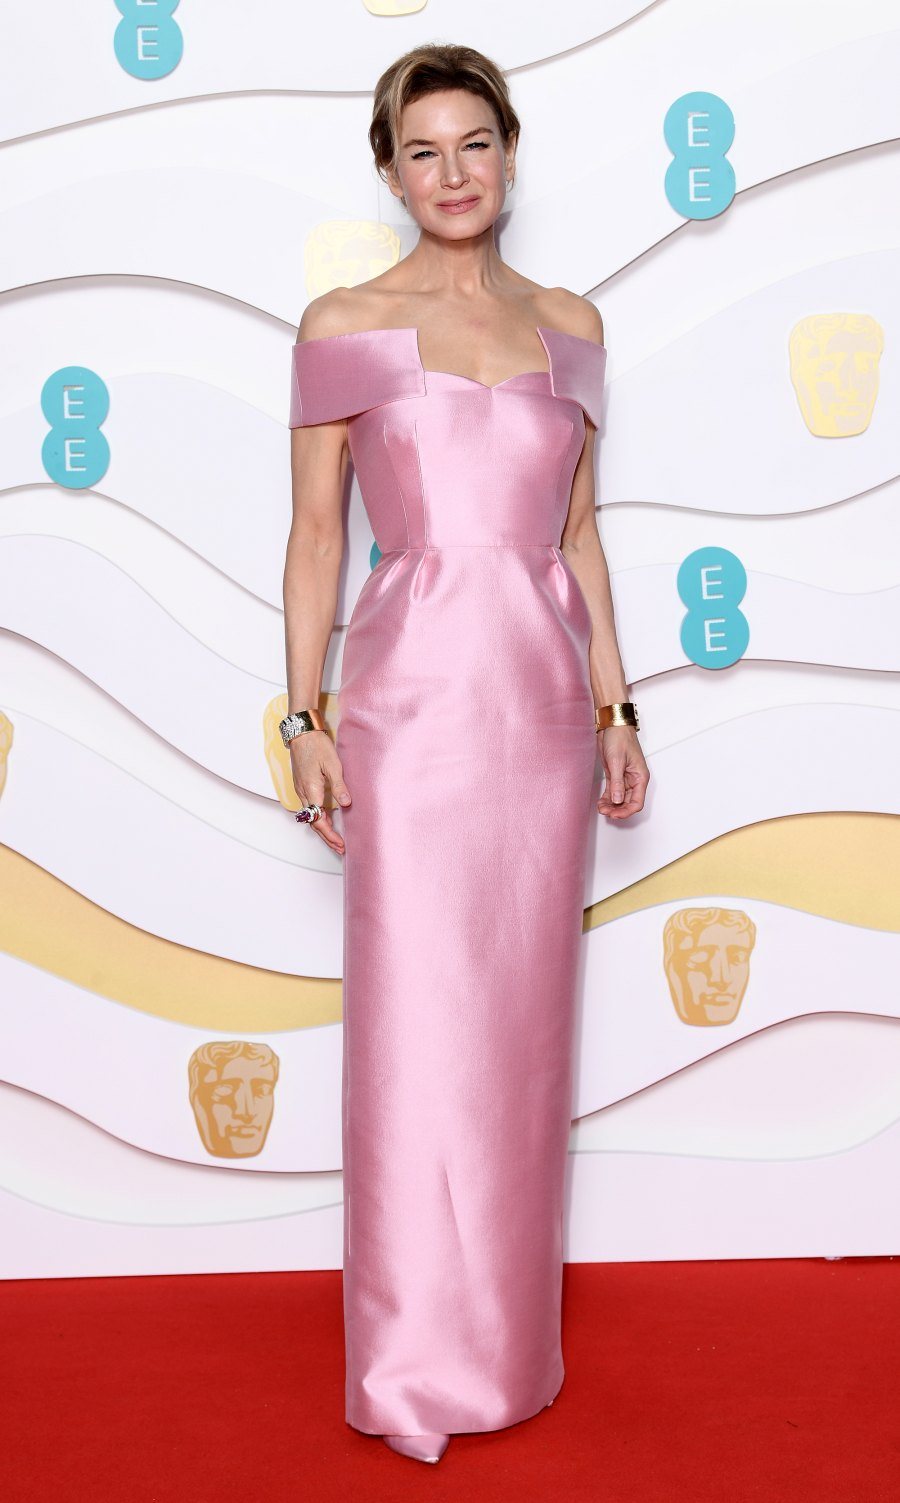 BAFTA Awards 2020 - Renee Zellweger